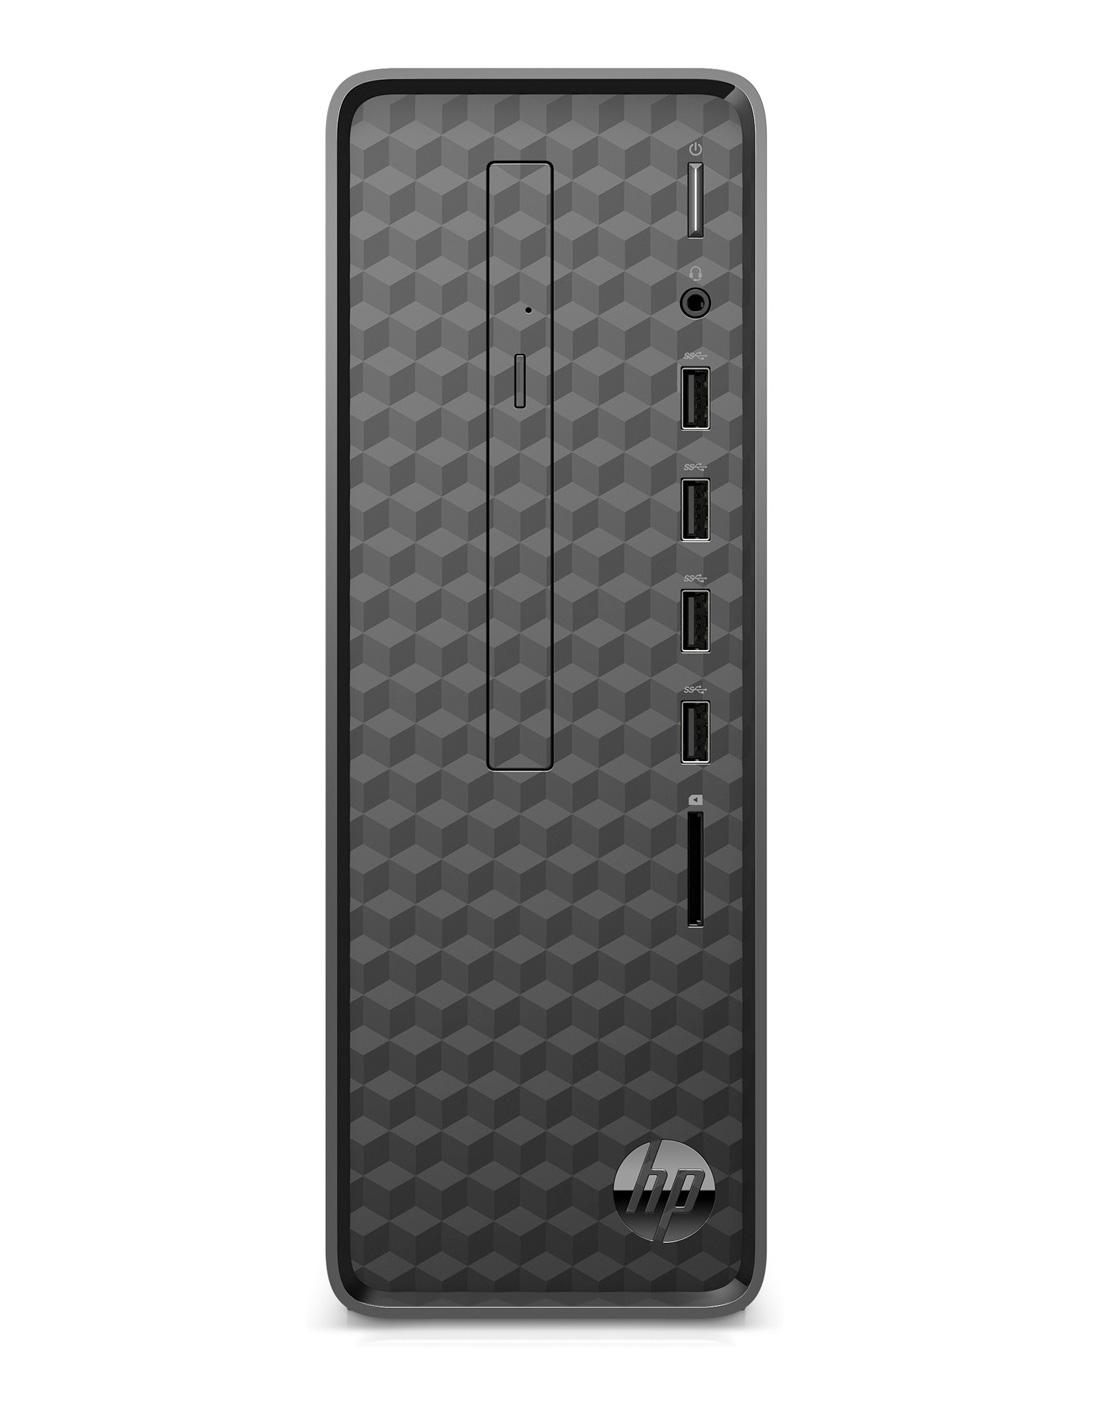 HP Slim Desktop S01-pF1010nf